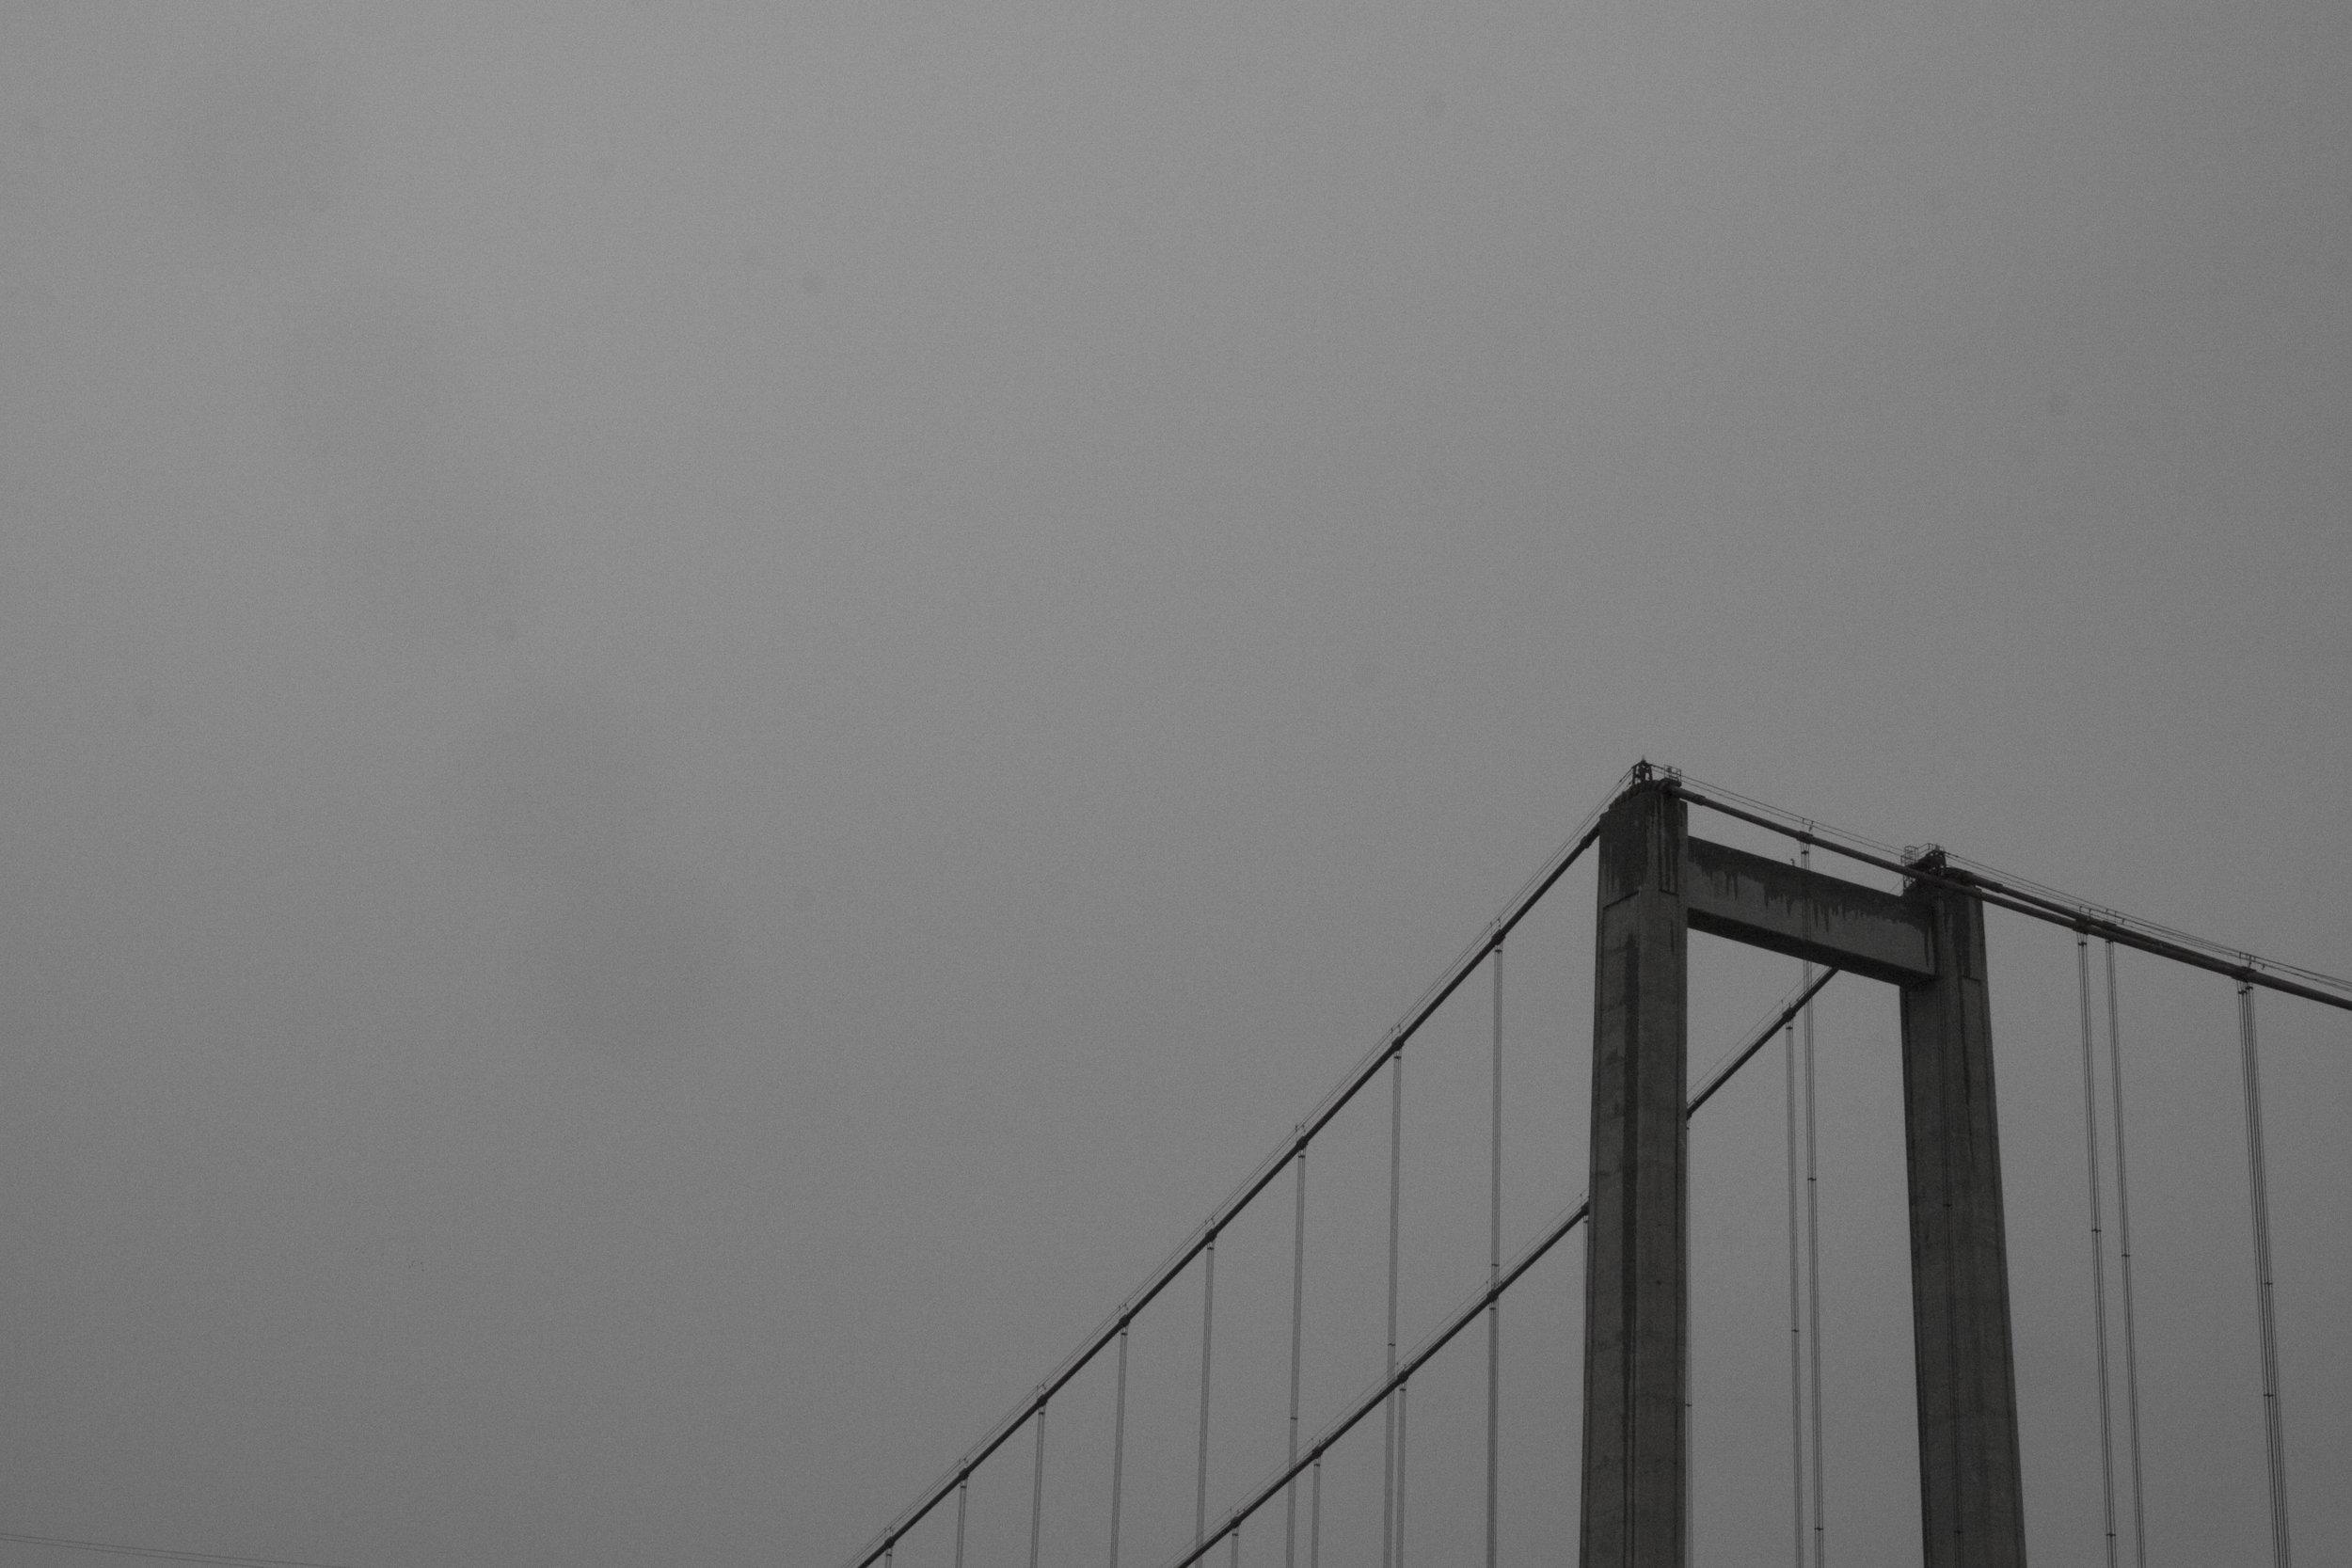 rain_98.jpg